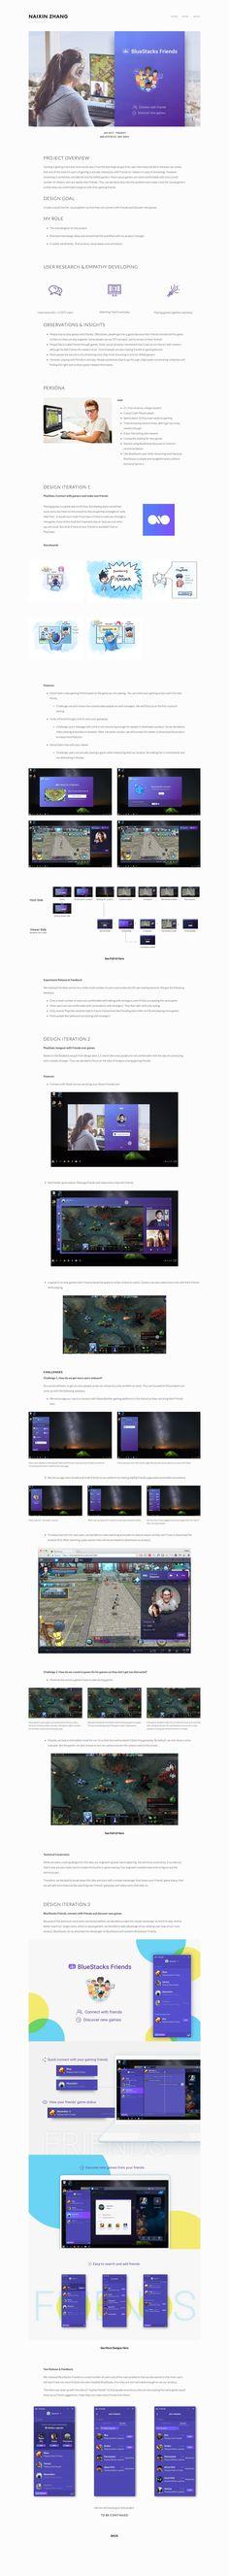 No signal on monitor fix it easy | Bluestacks | Pinterest